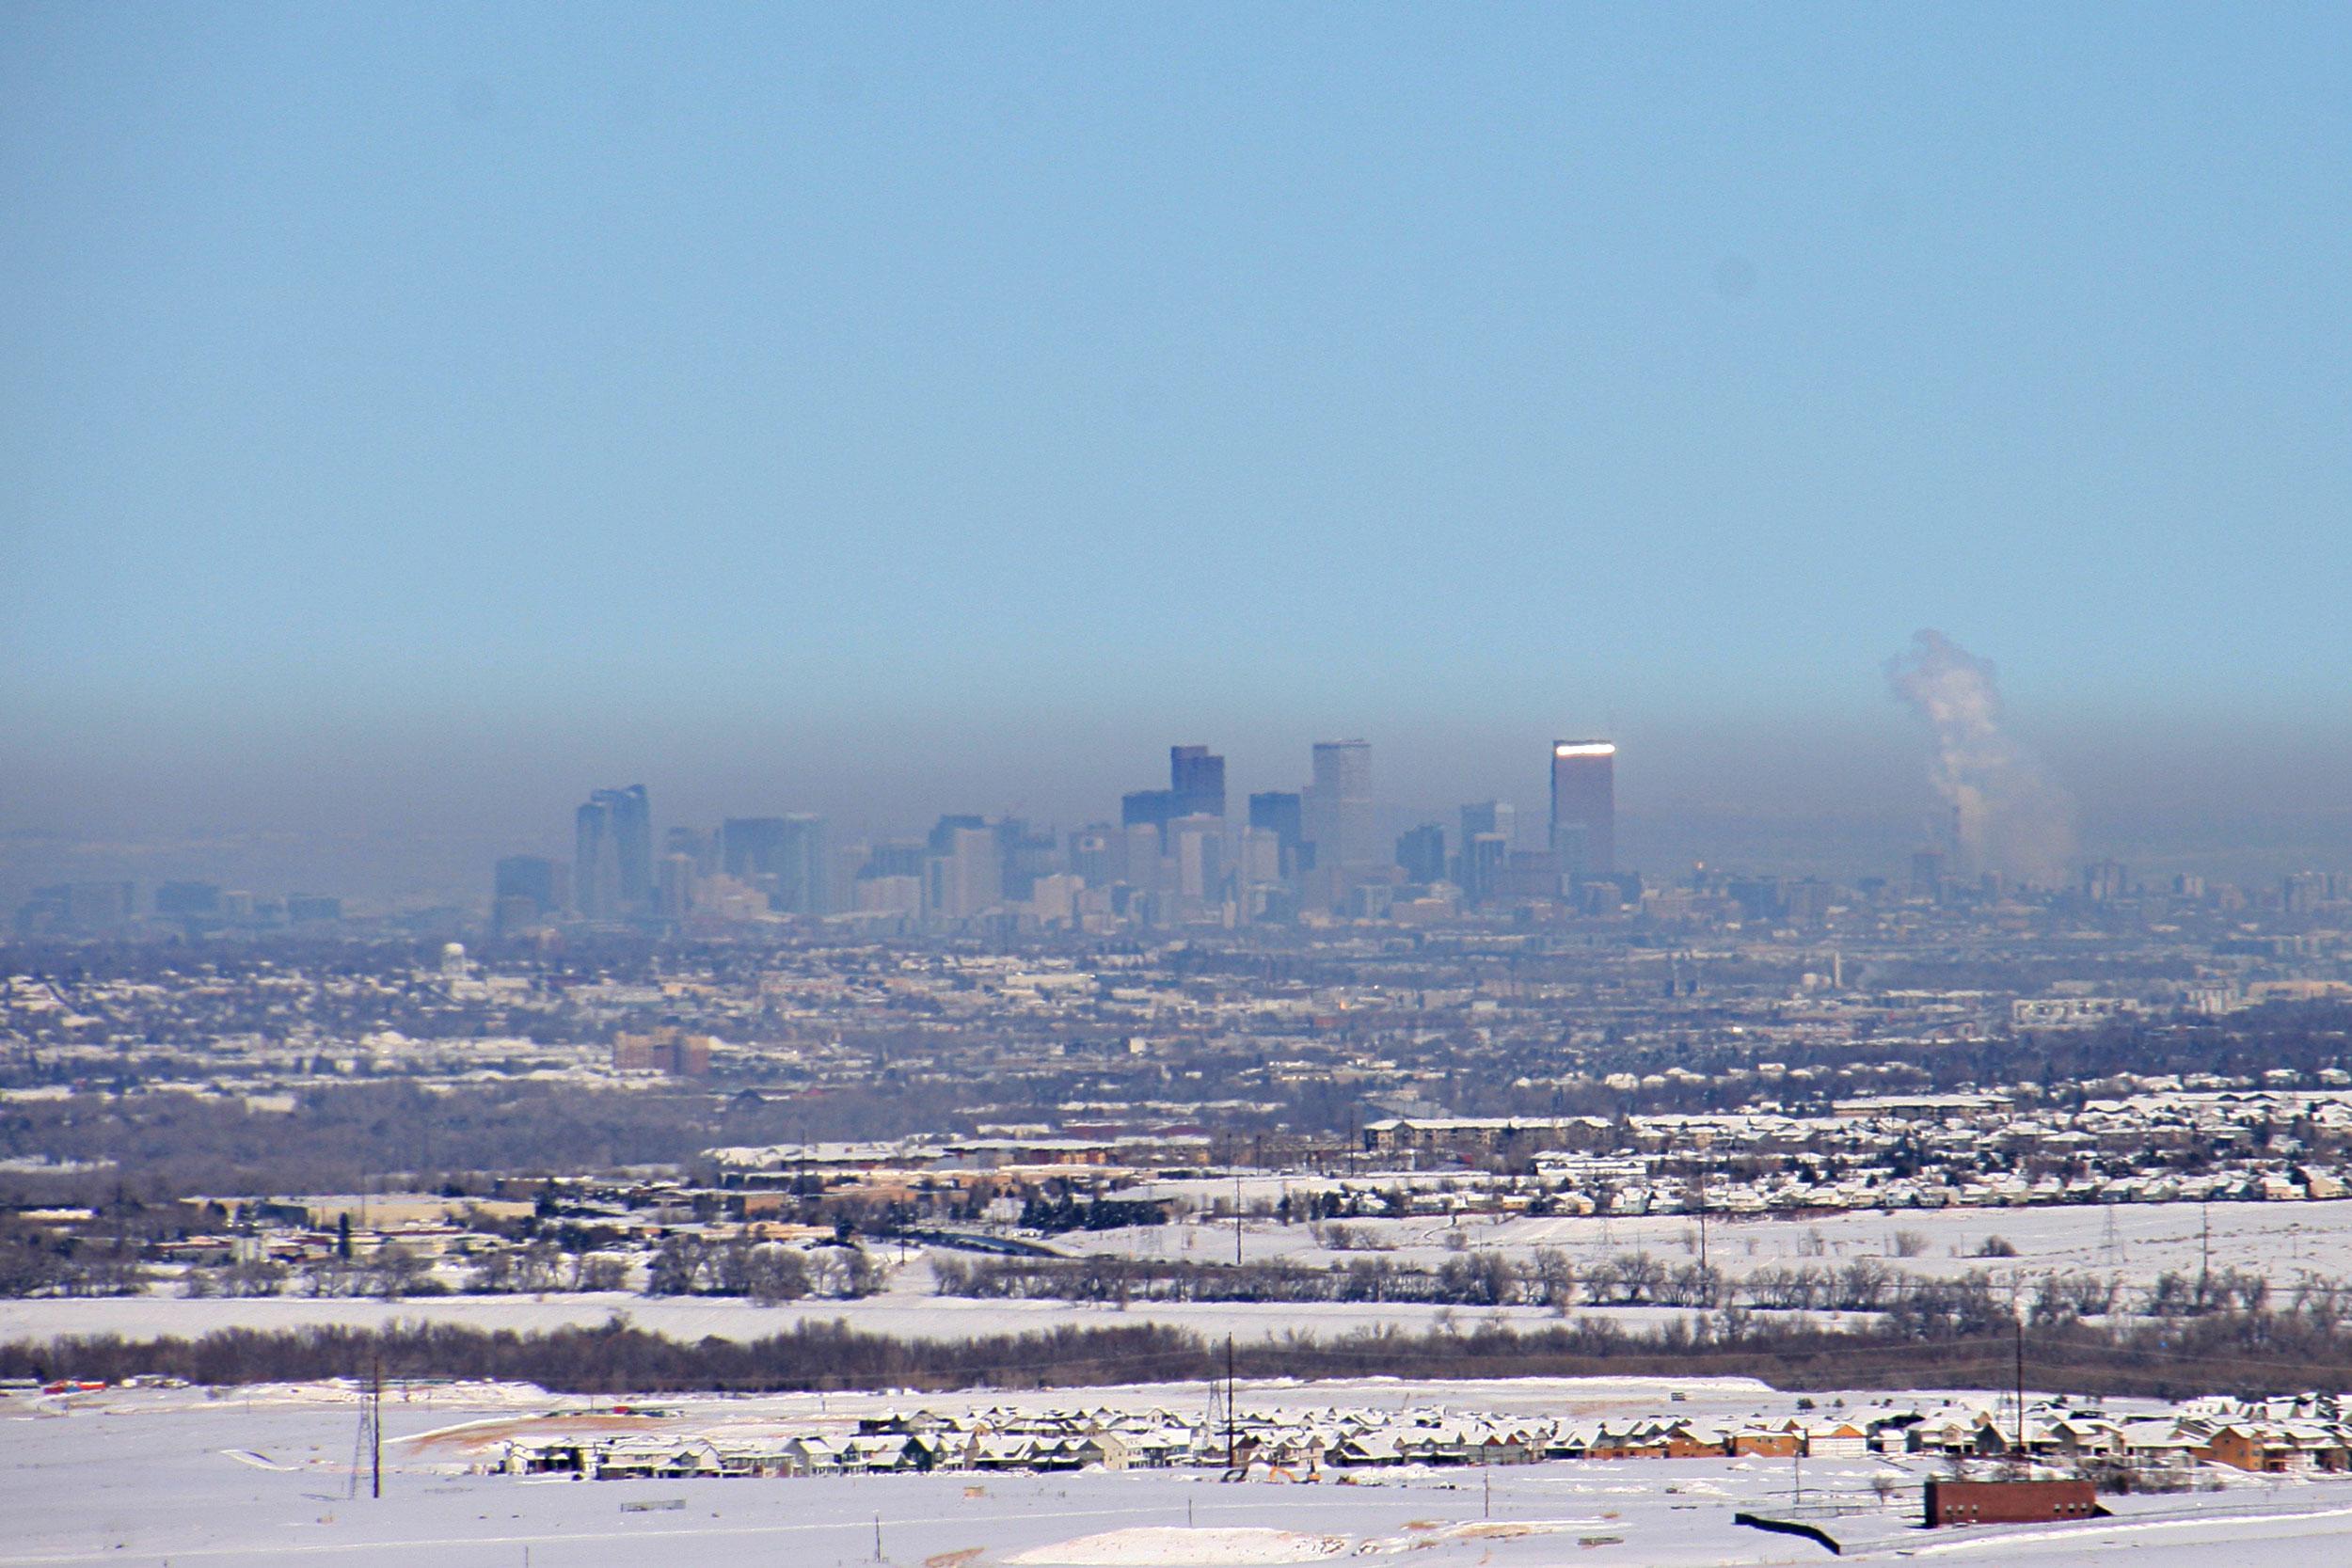 Air pollution over Denver